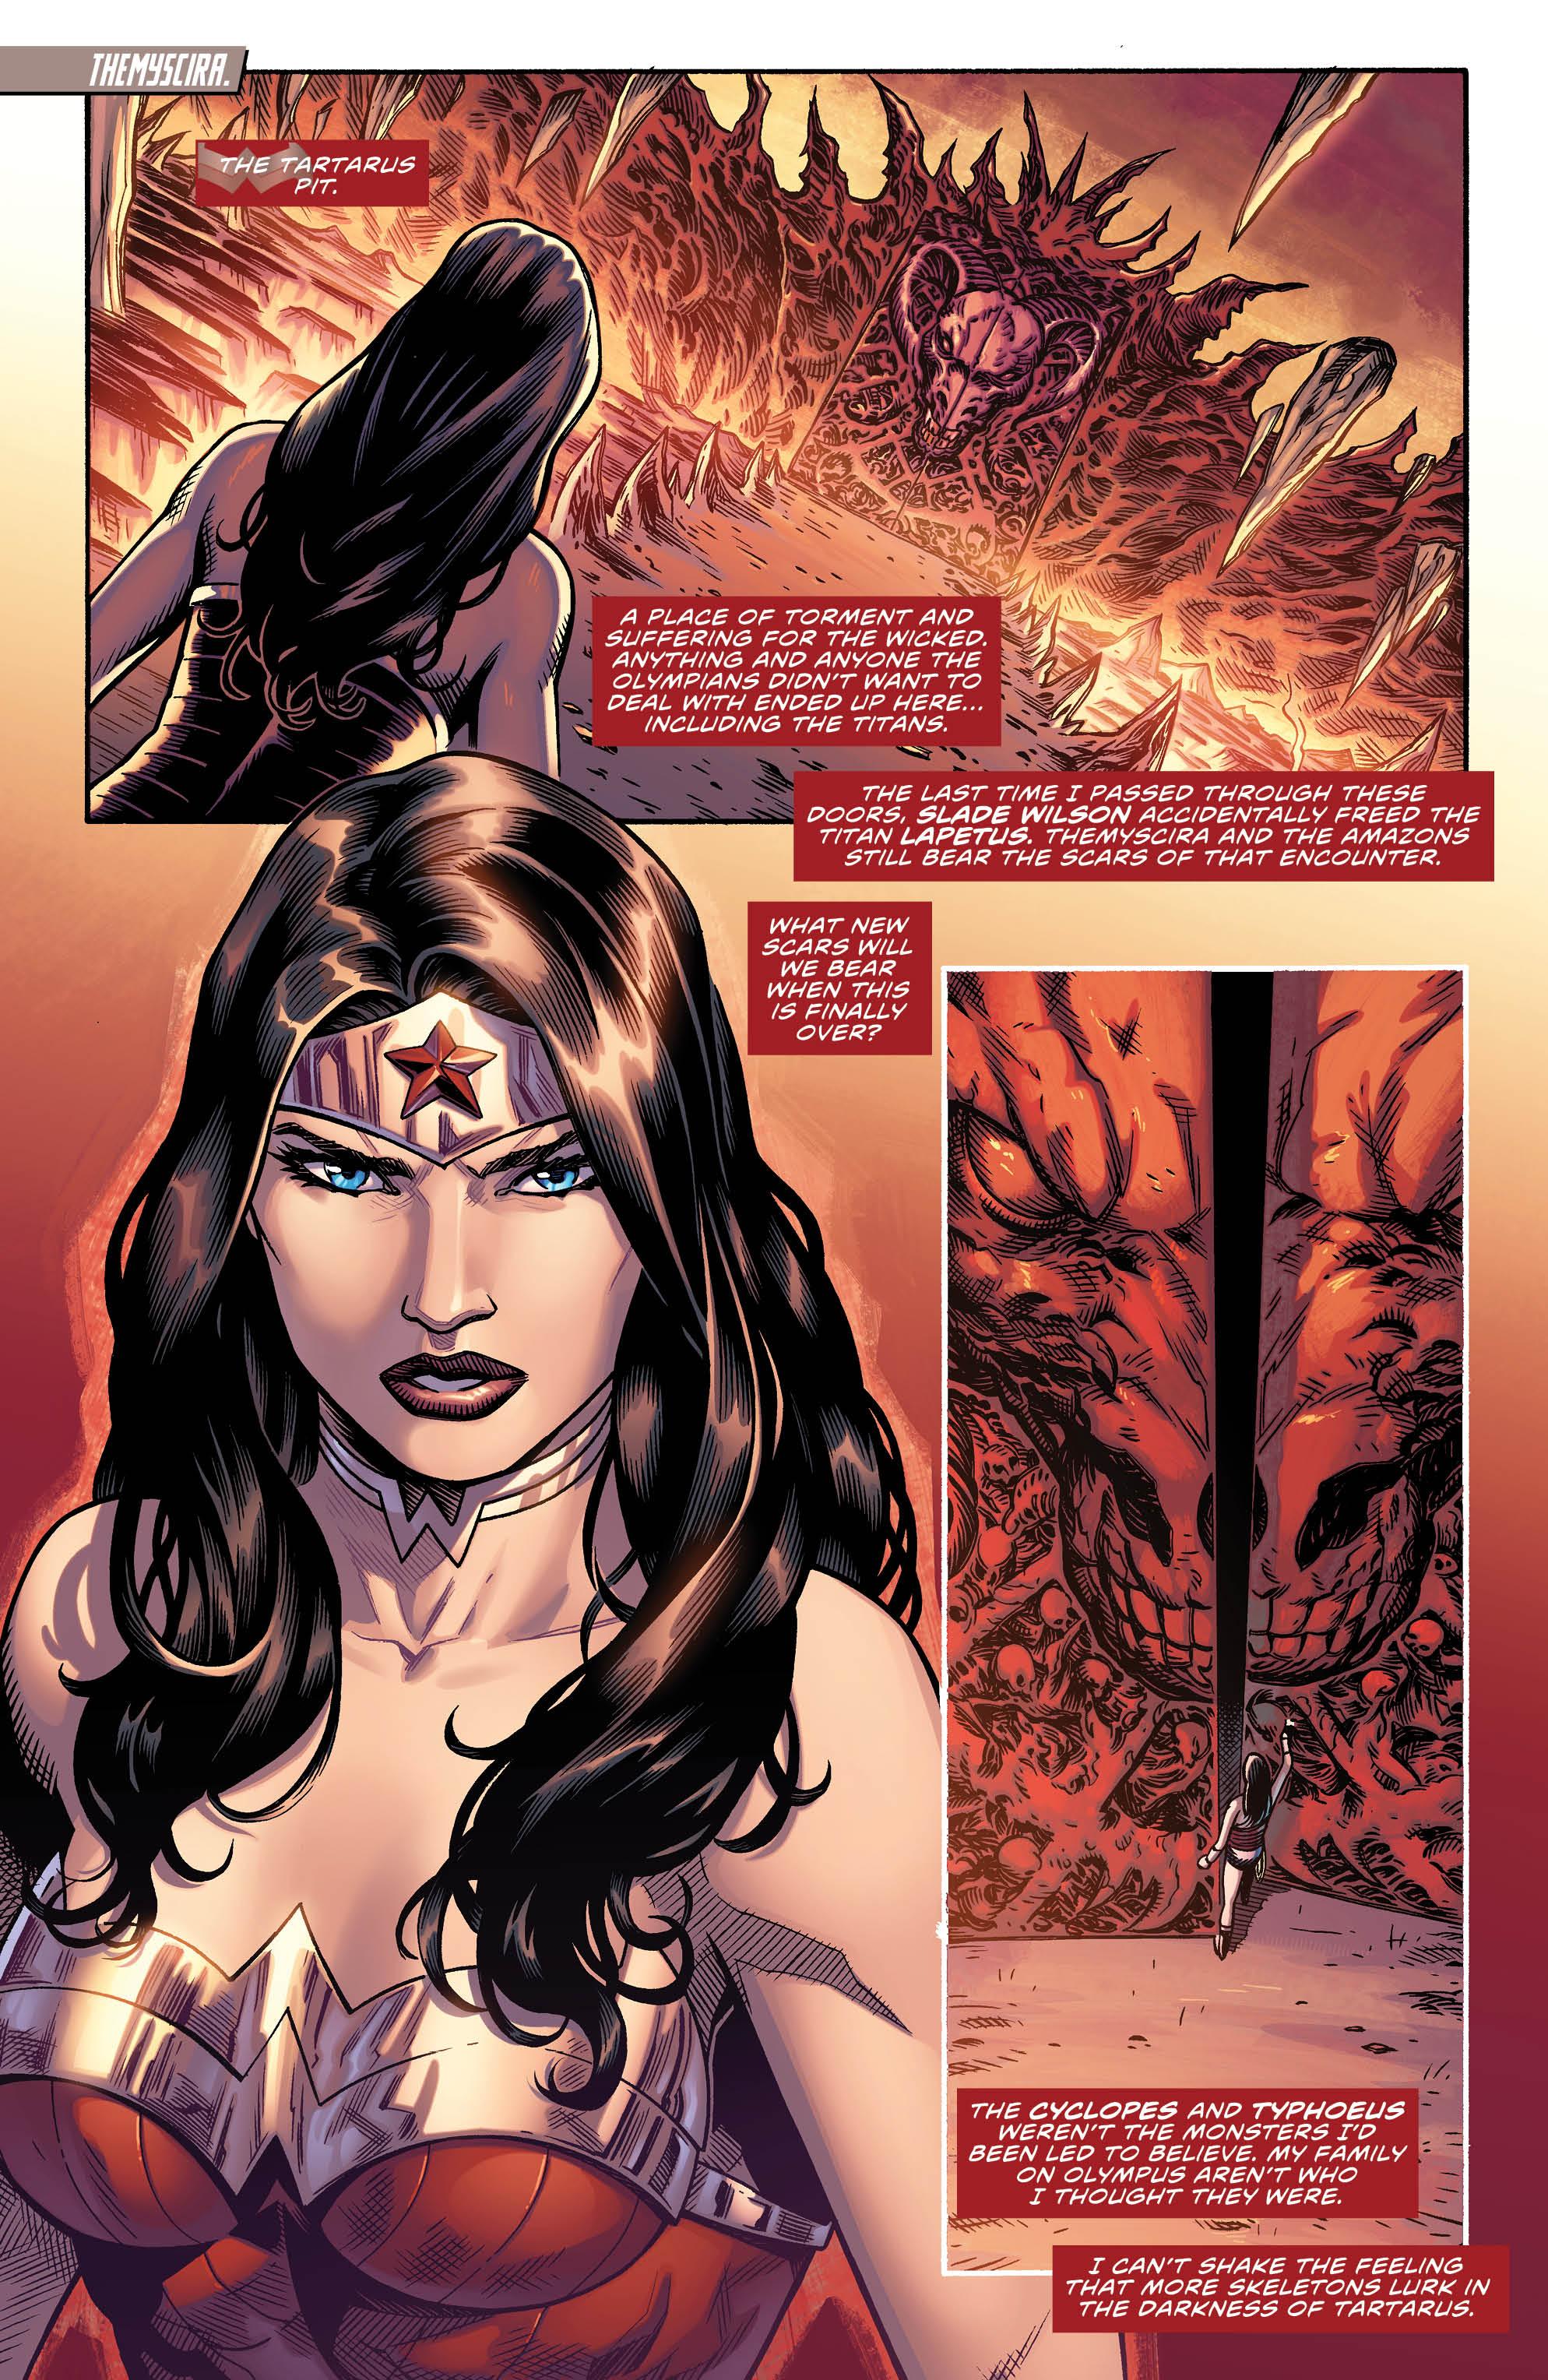 WONDER WOMAN #51 page 1